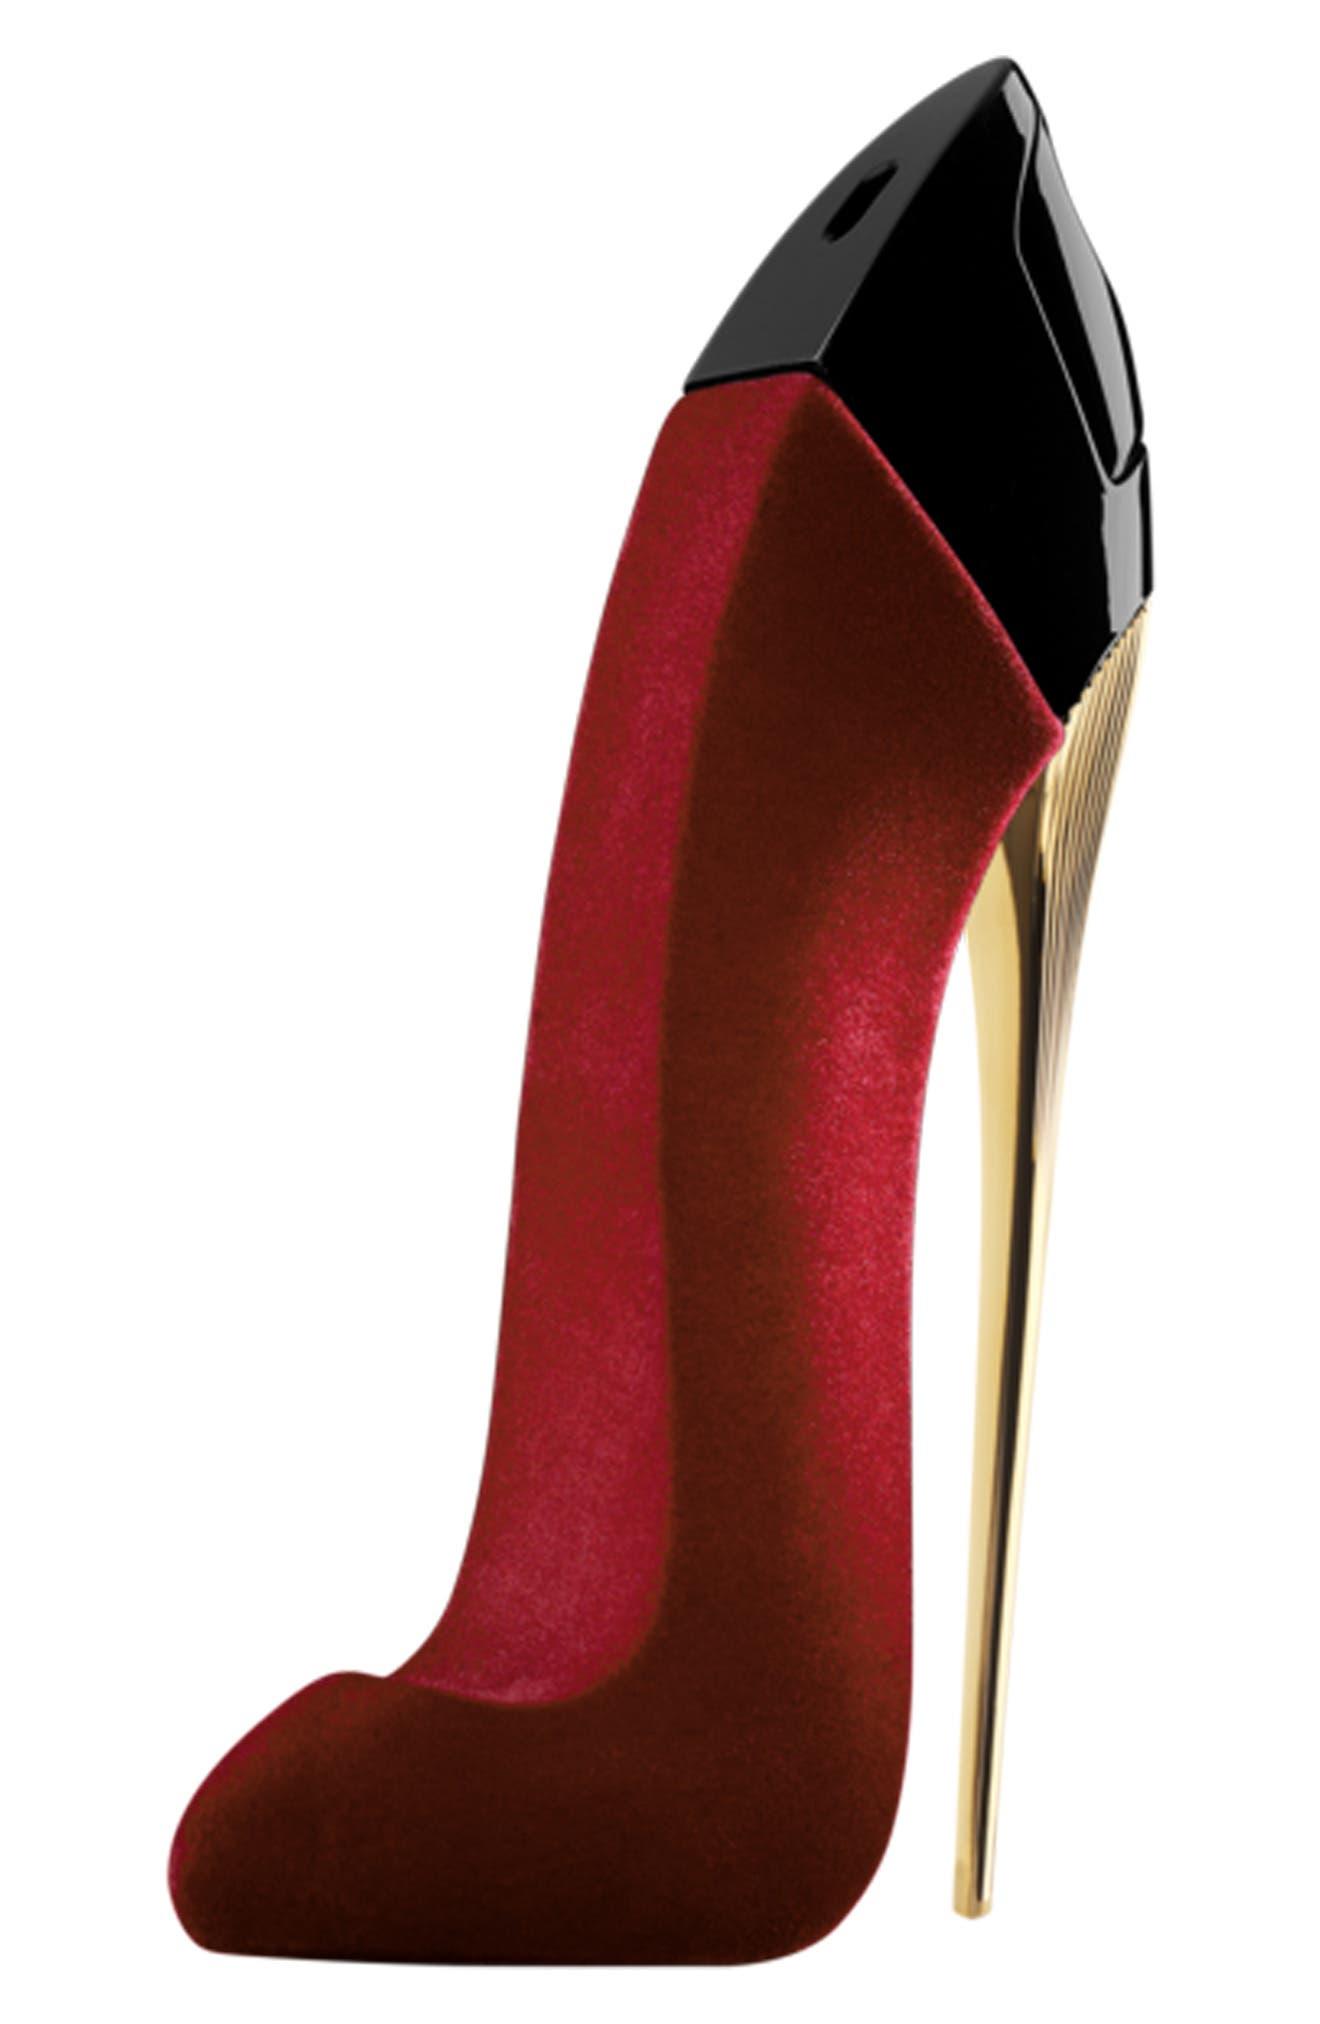 CAROLINA HERRERA,                             Good Girl Velvet Fatale Eau de Parfum Collector Edition,                             Main thumbnail 1, color,                             000